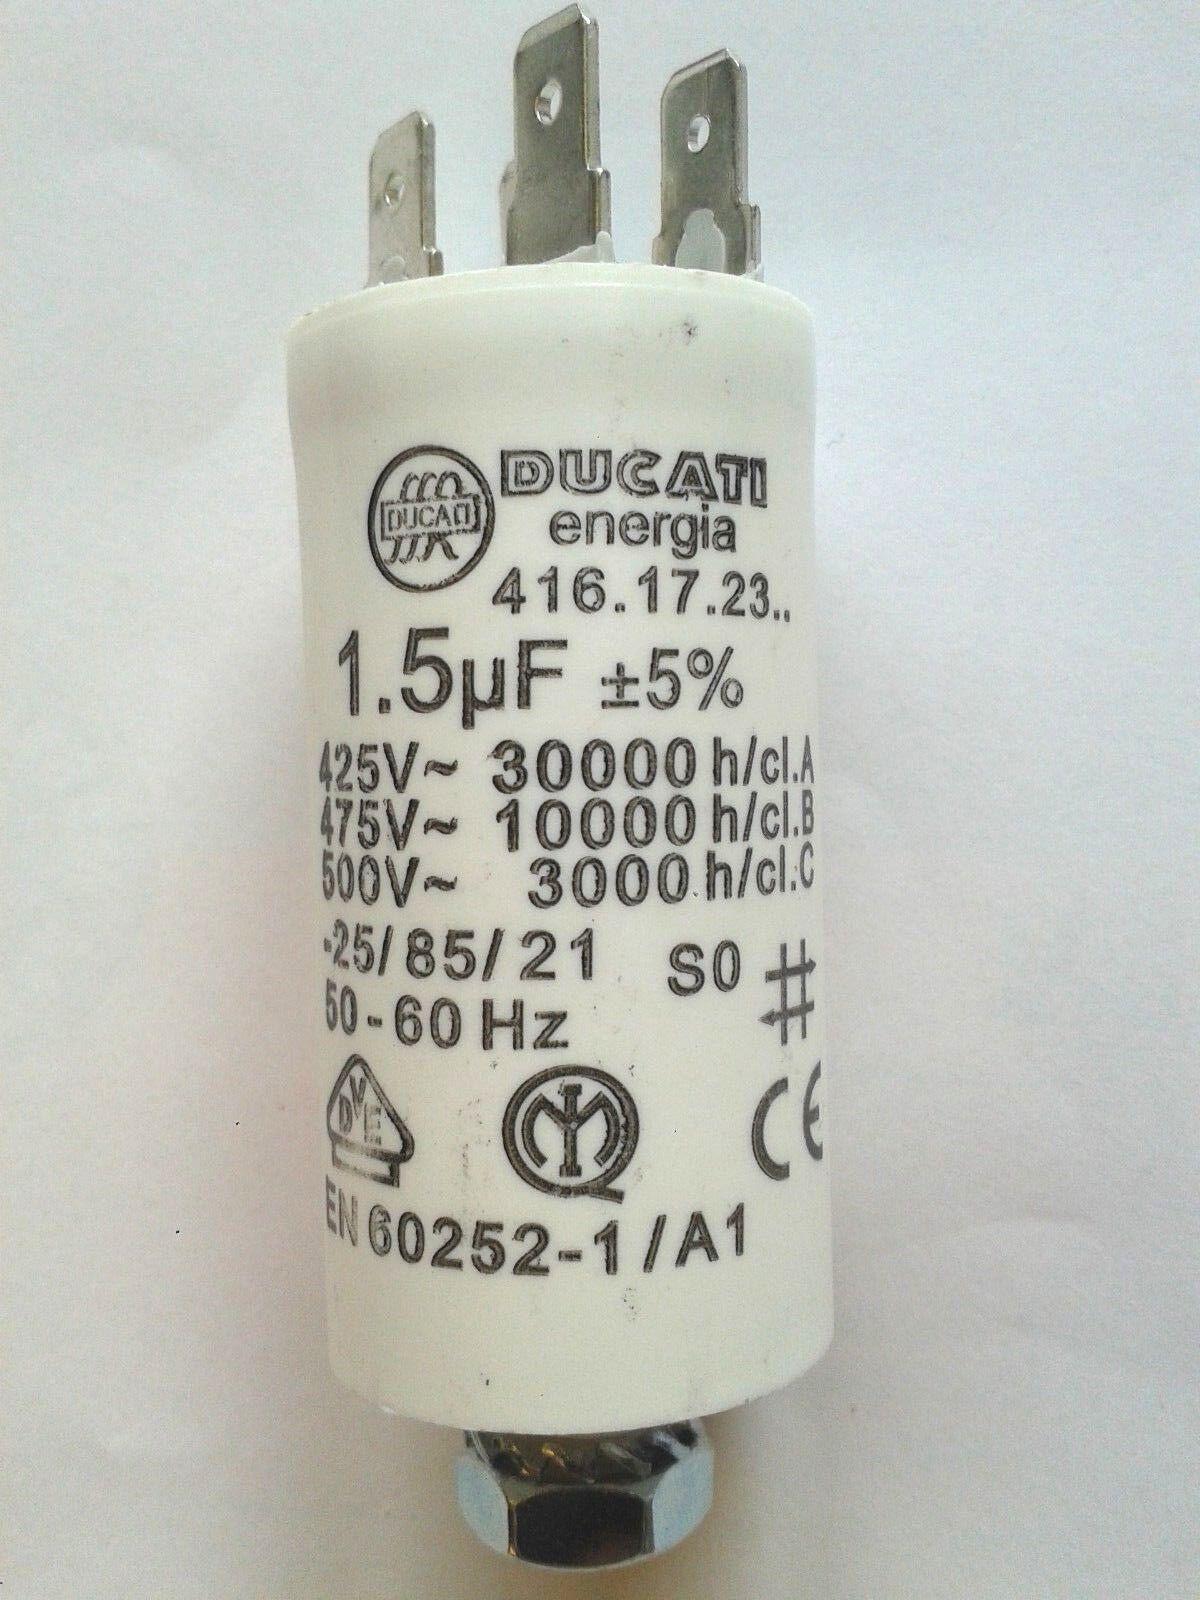 Betriebskondensator Motorkondensator Ducati 1,9uF 4.16.17.C7.06